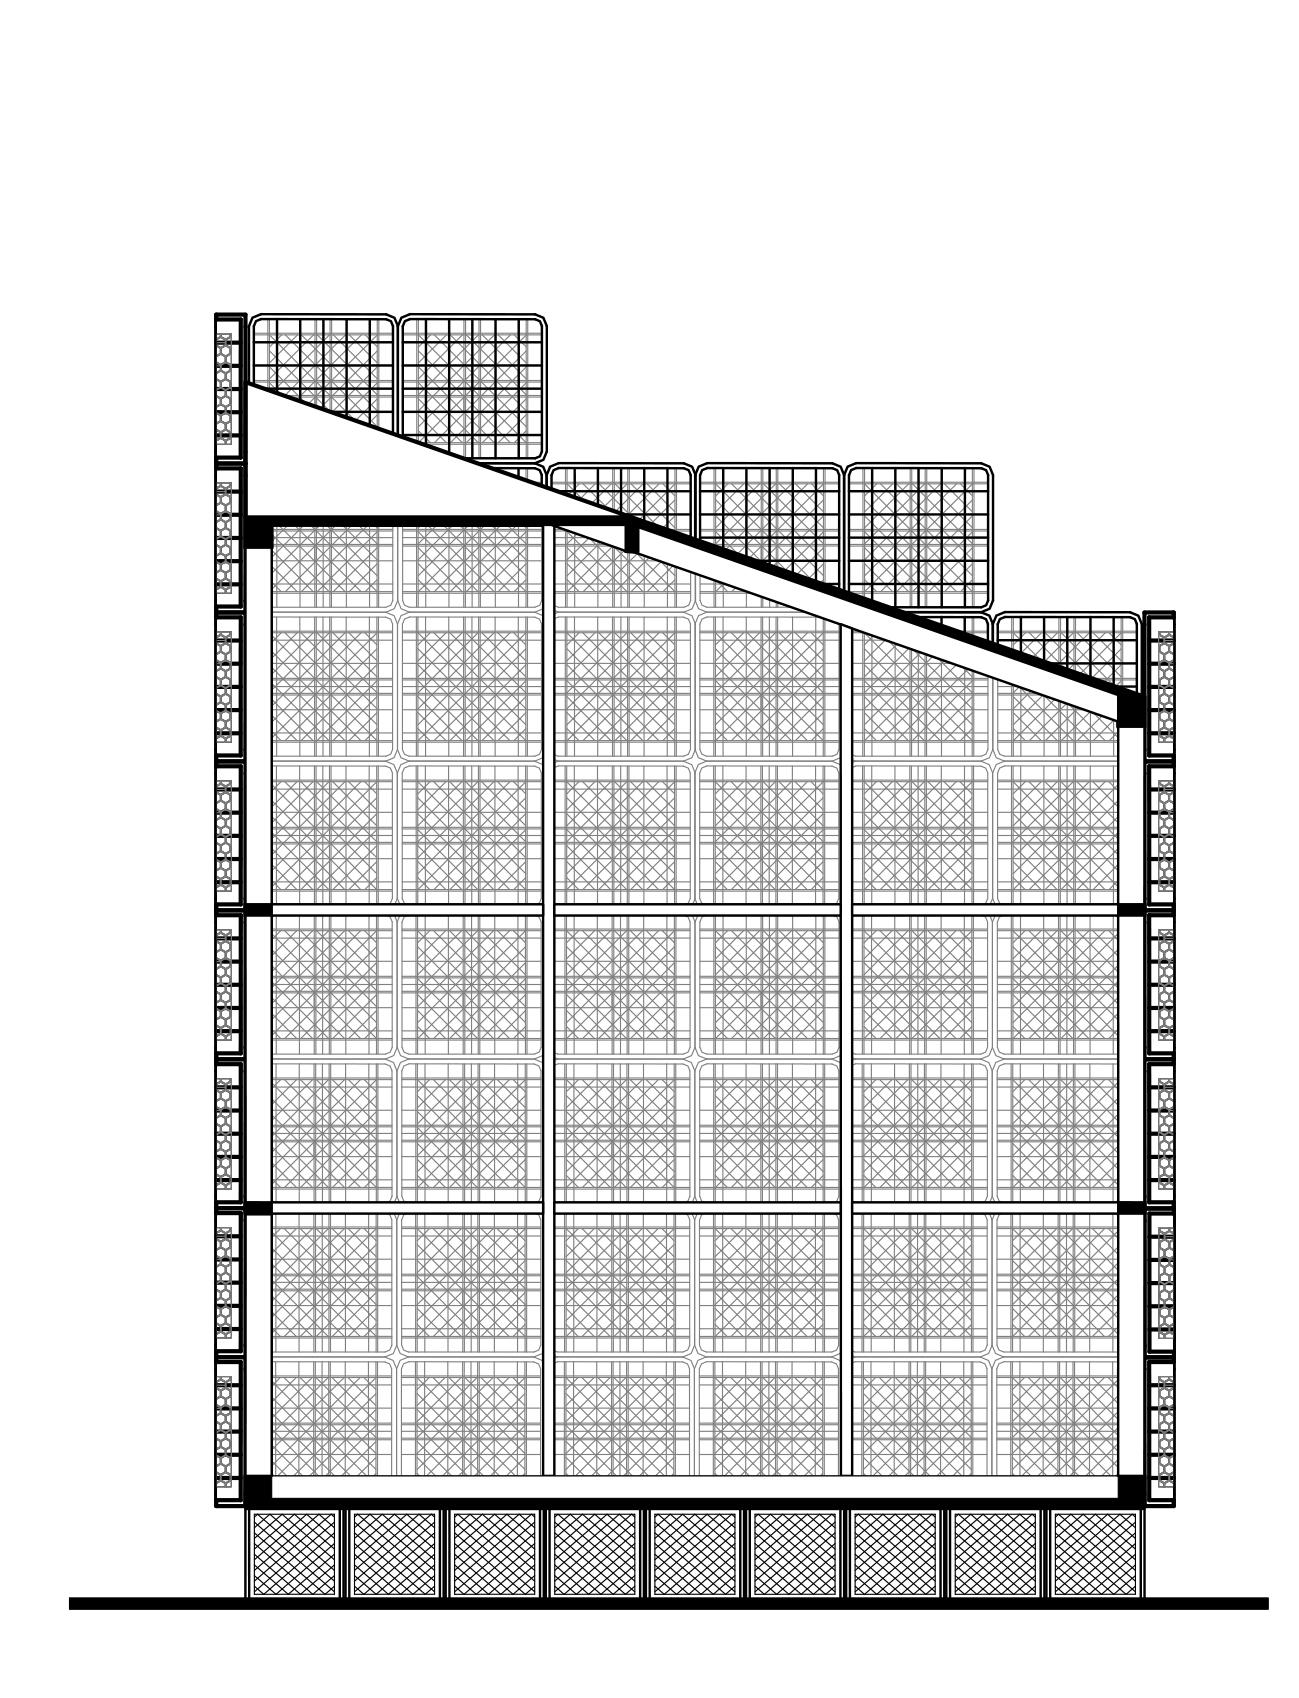 20190729-Section-2.jpg